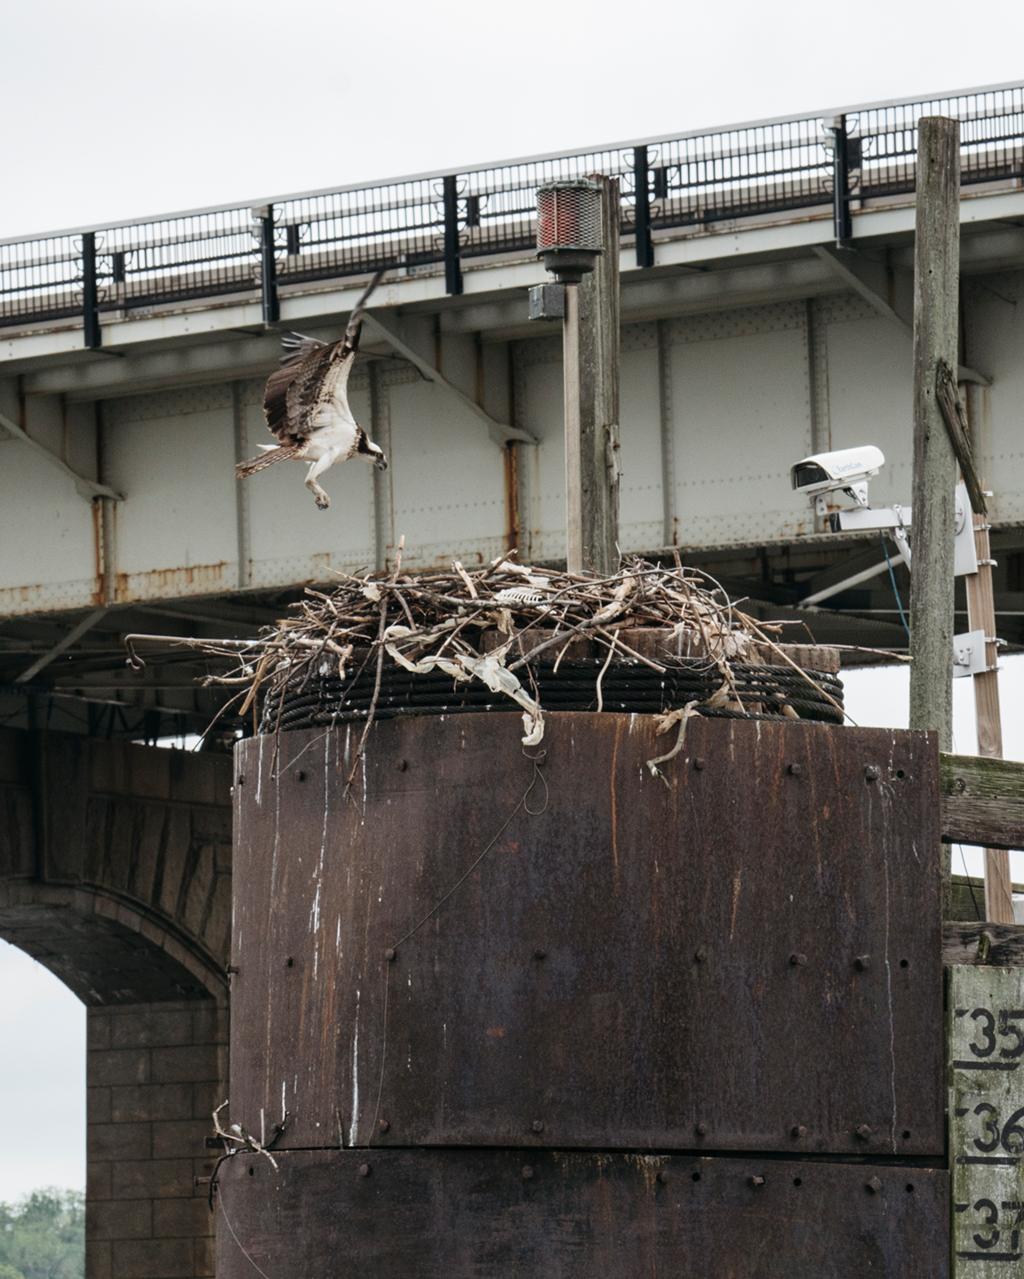 An osprey returns to its eggs–just below Southeast DC's Frederick Douglass Memorial Bridge–as a camera watches. Photograph by Greg Kahn.